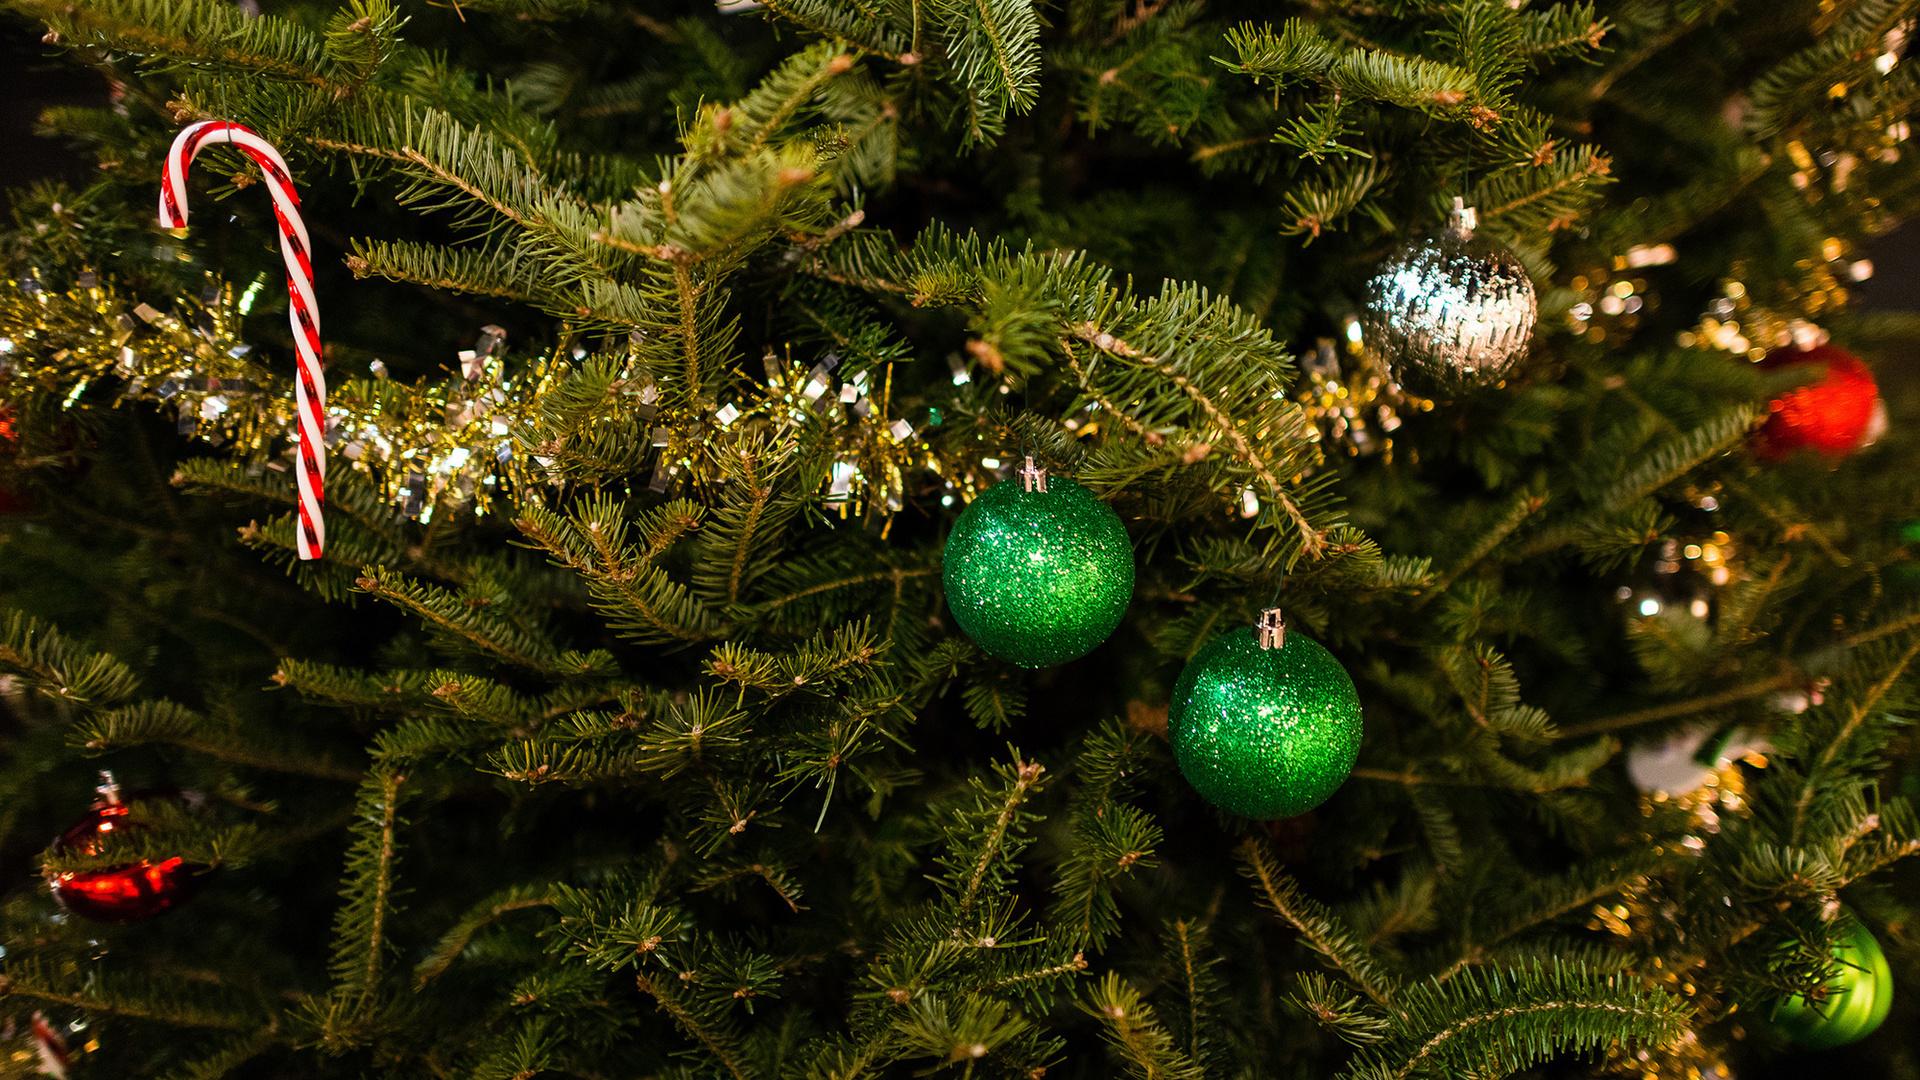 увидите картинки наша елка хороша опухоли